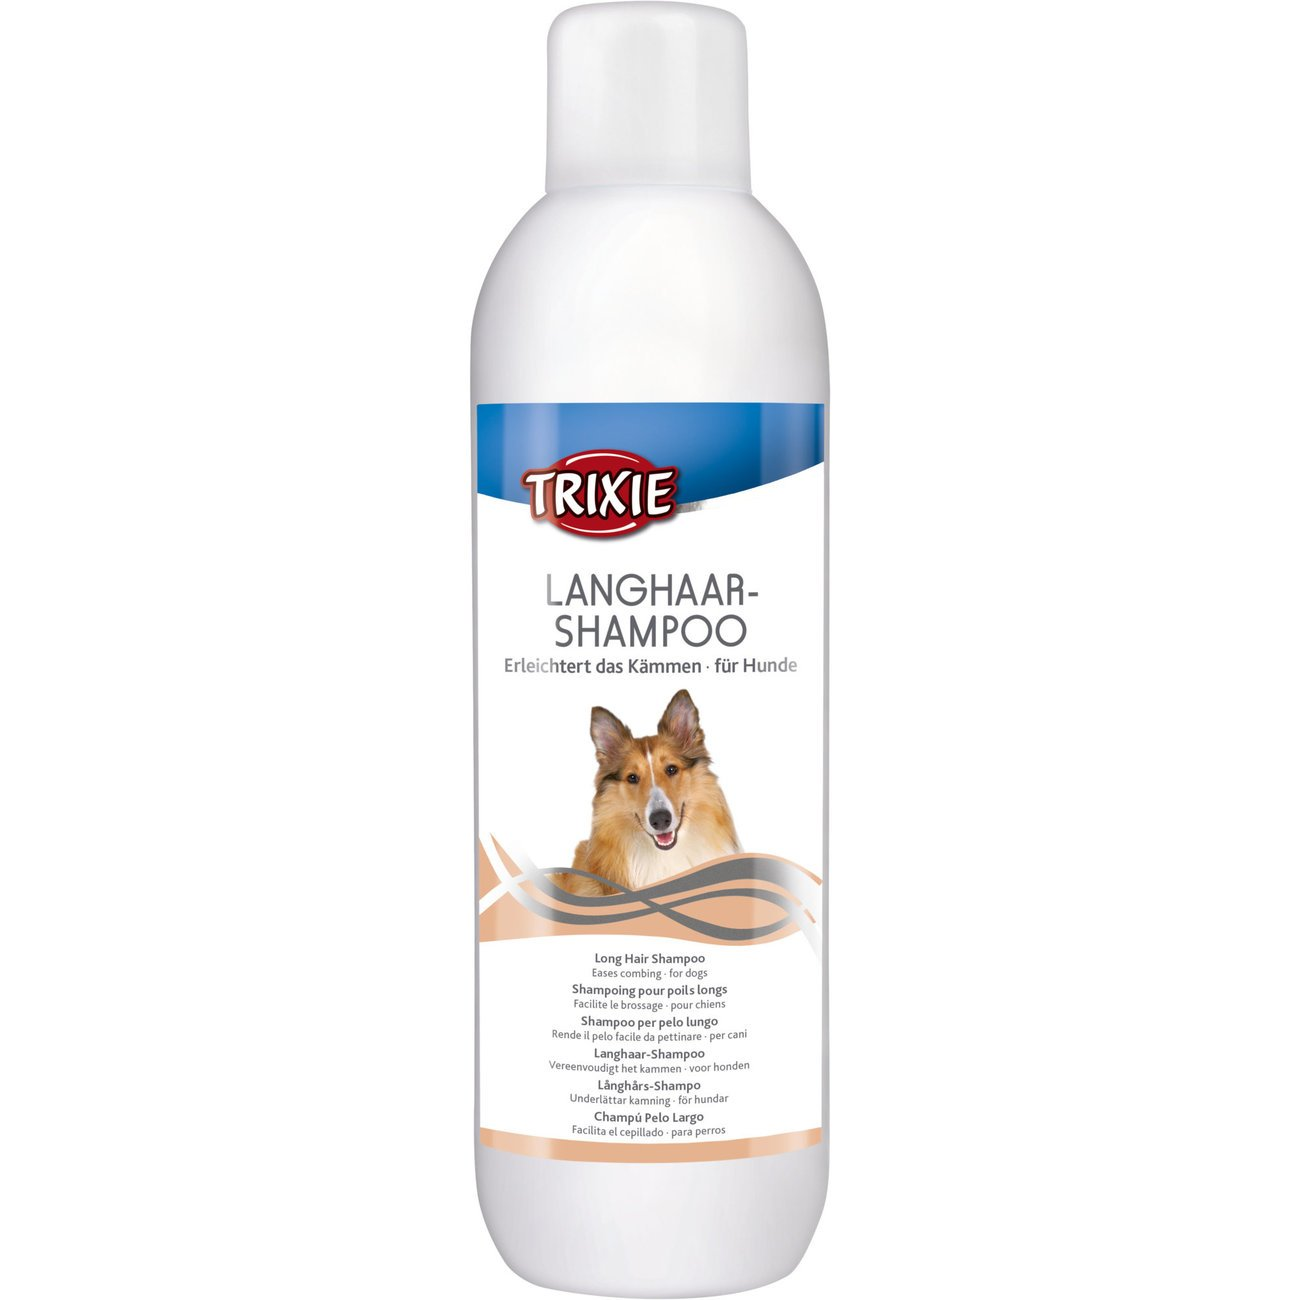 Trixie Langhaar Hundeshampoo, 1 l